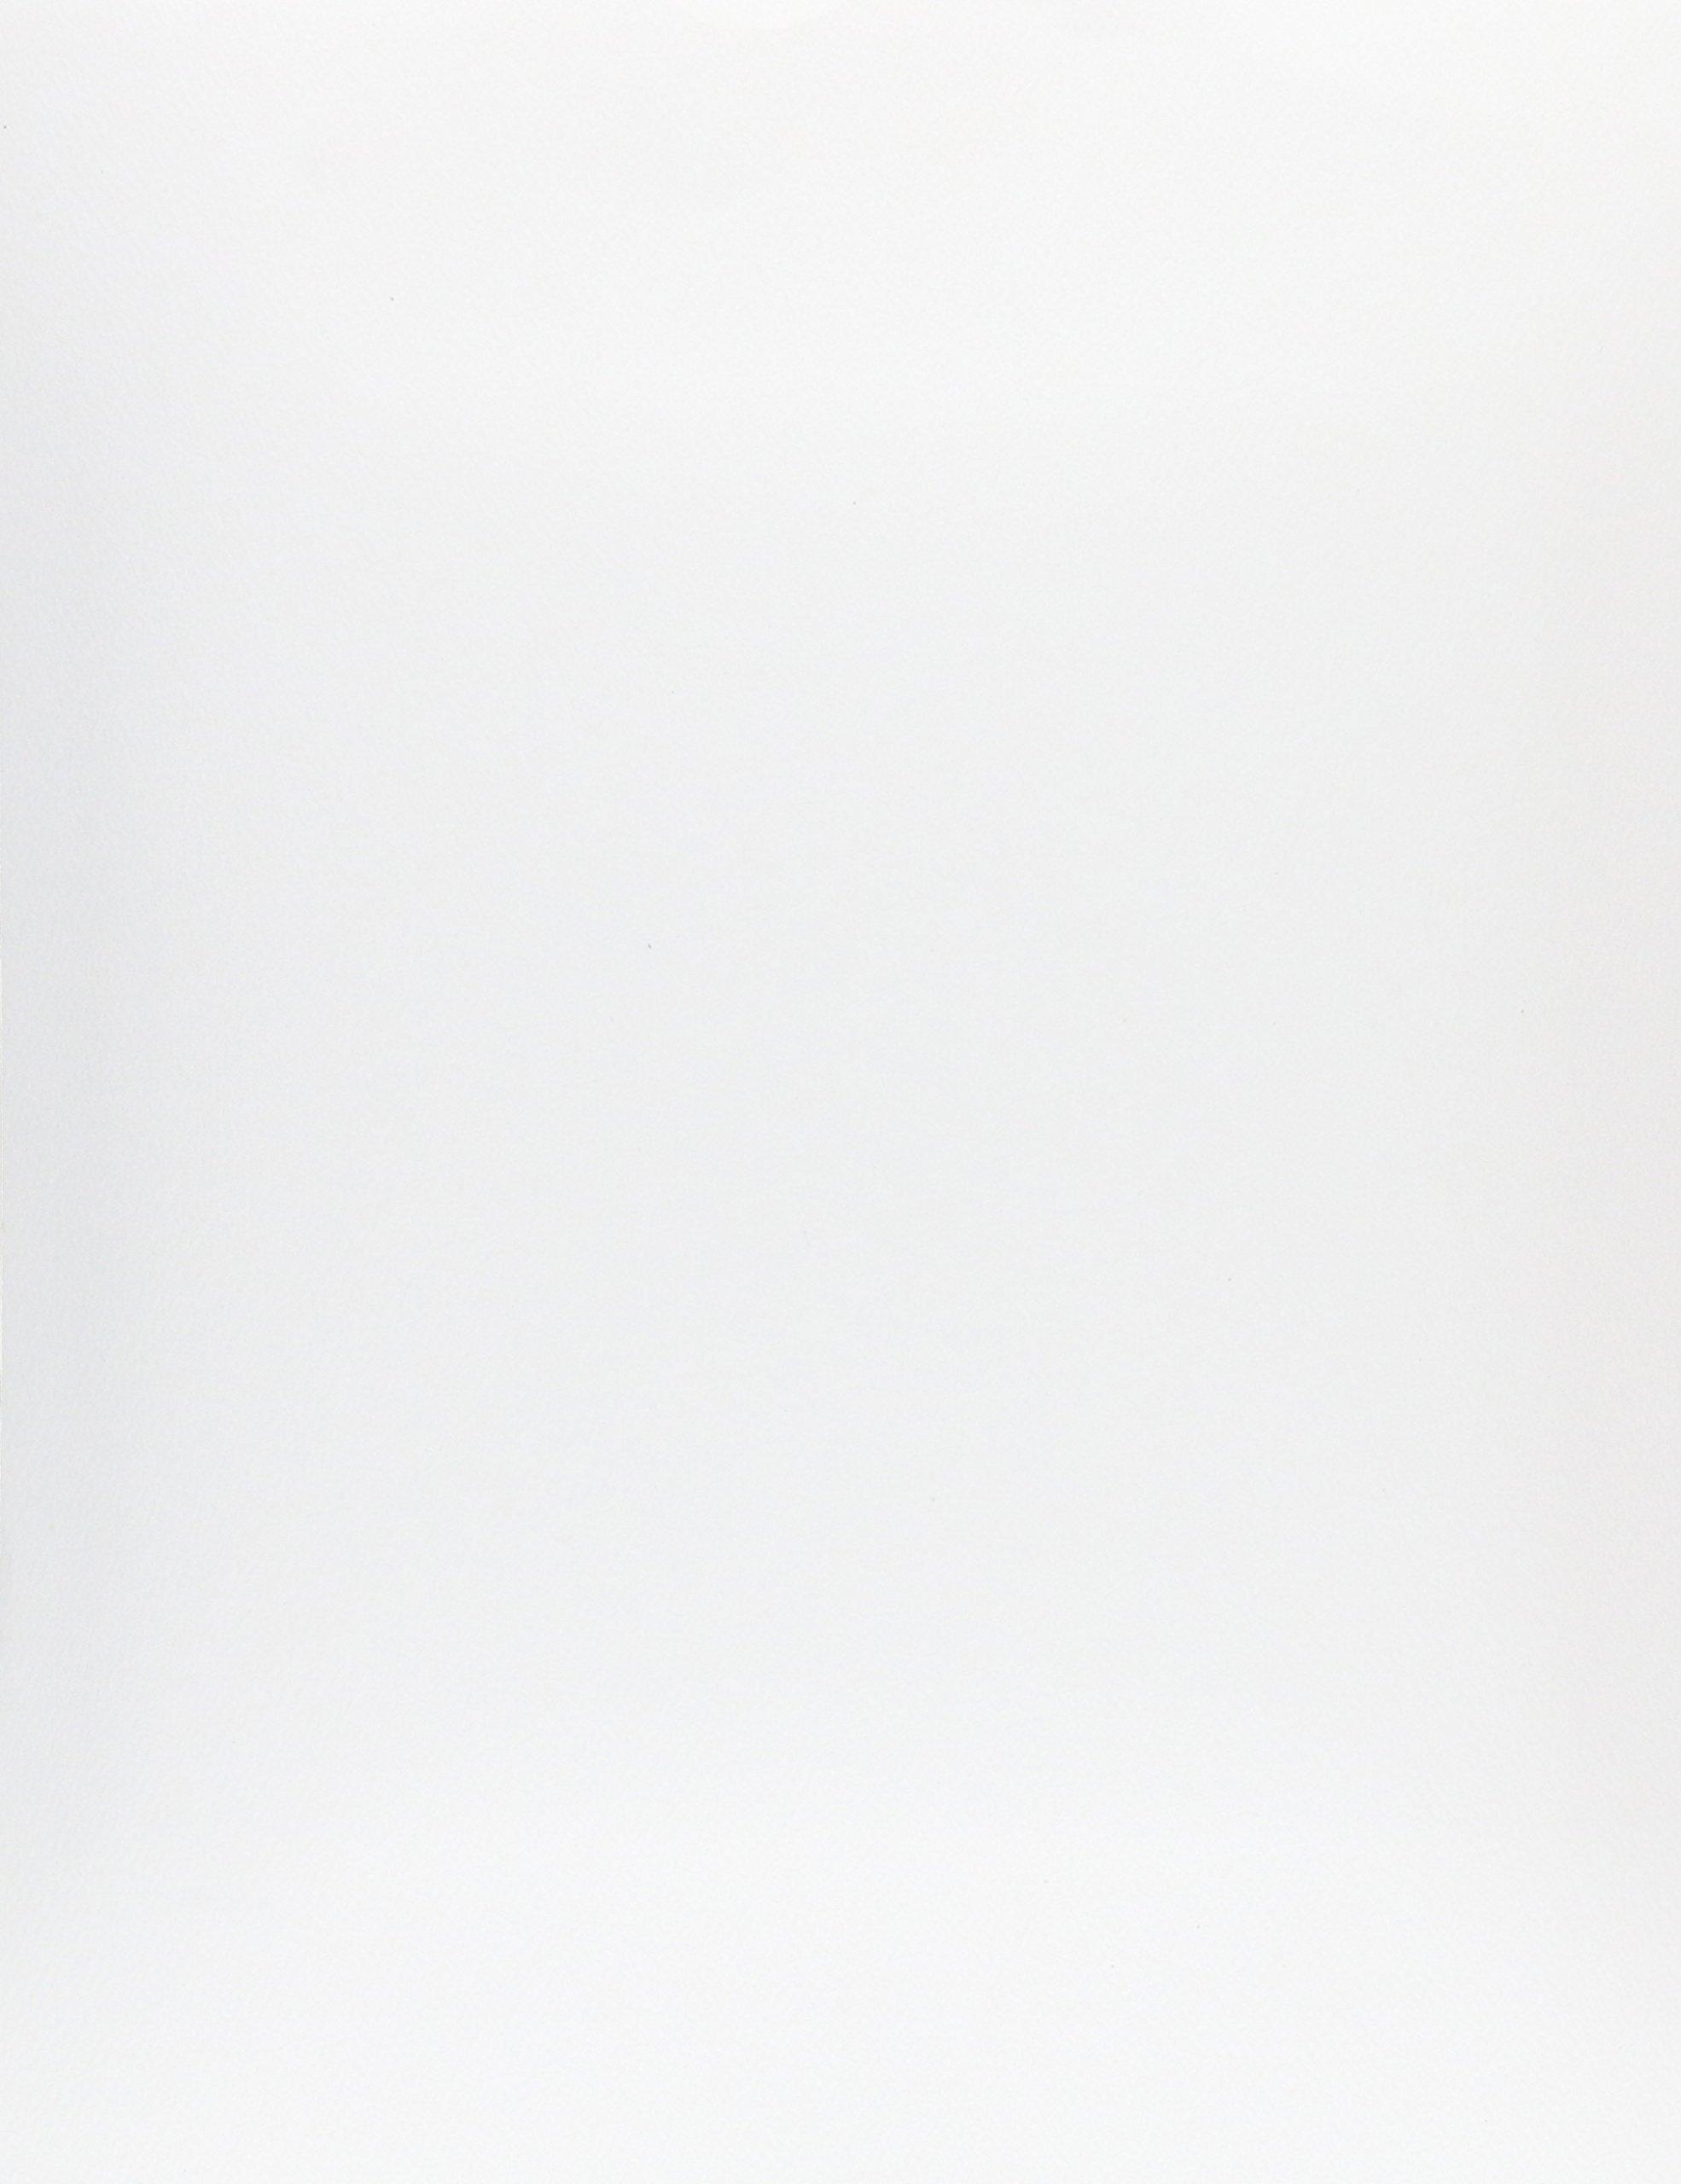 Kodak 3500 TRANSPORT CLEANING-SHEETS ( 169-0783 )